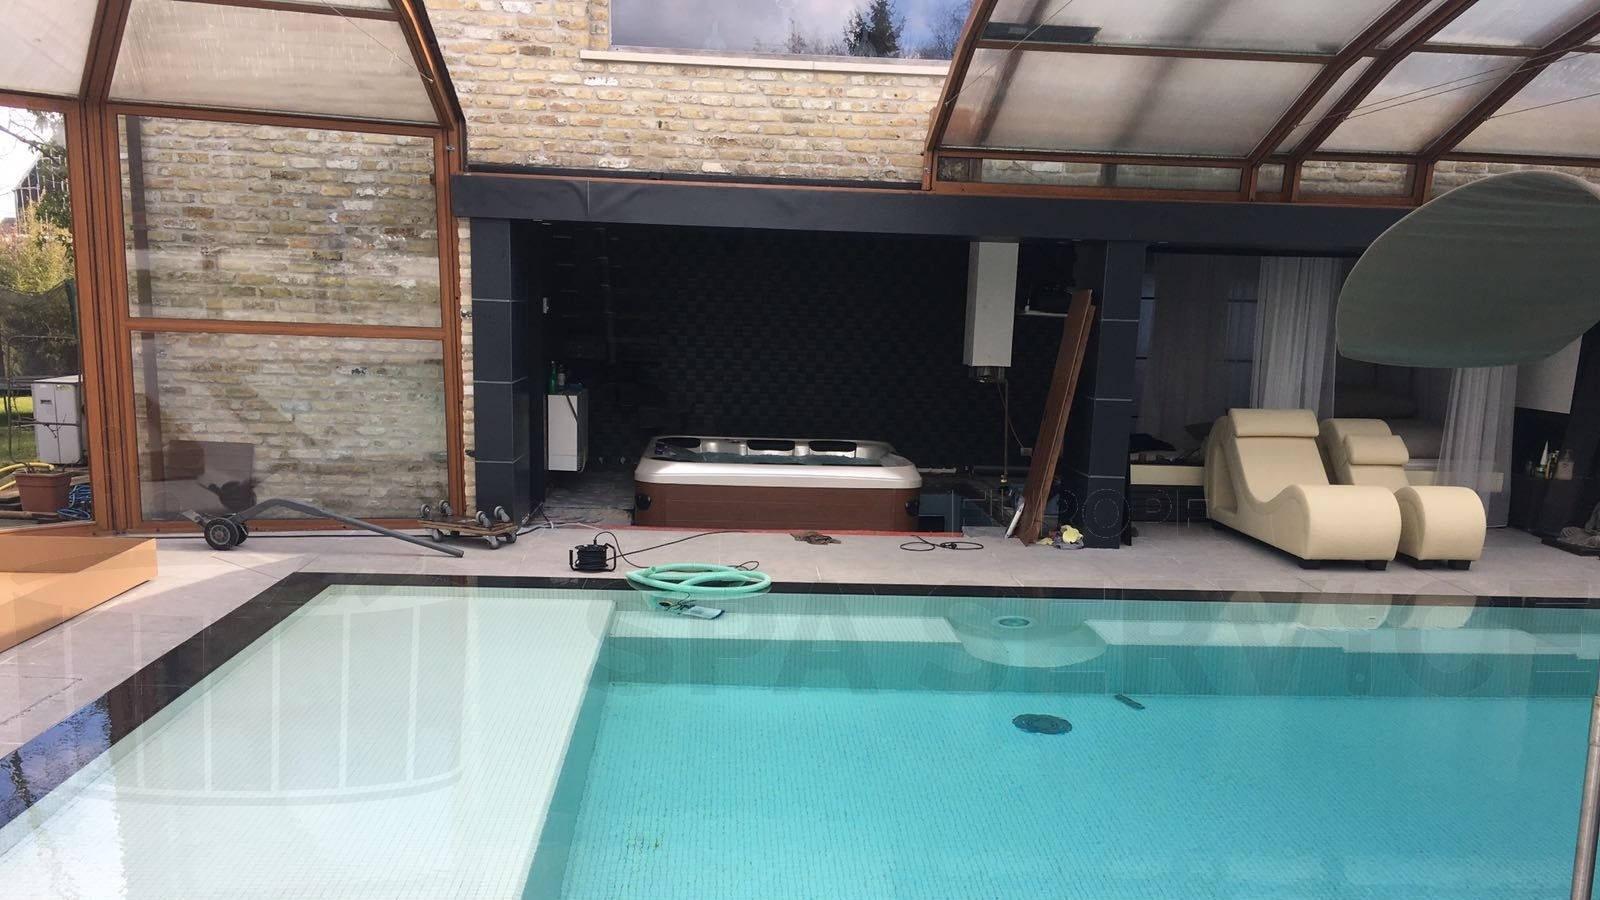 Plaatsing Villeroy & Boch A7LE spa in Zedelgem België